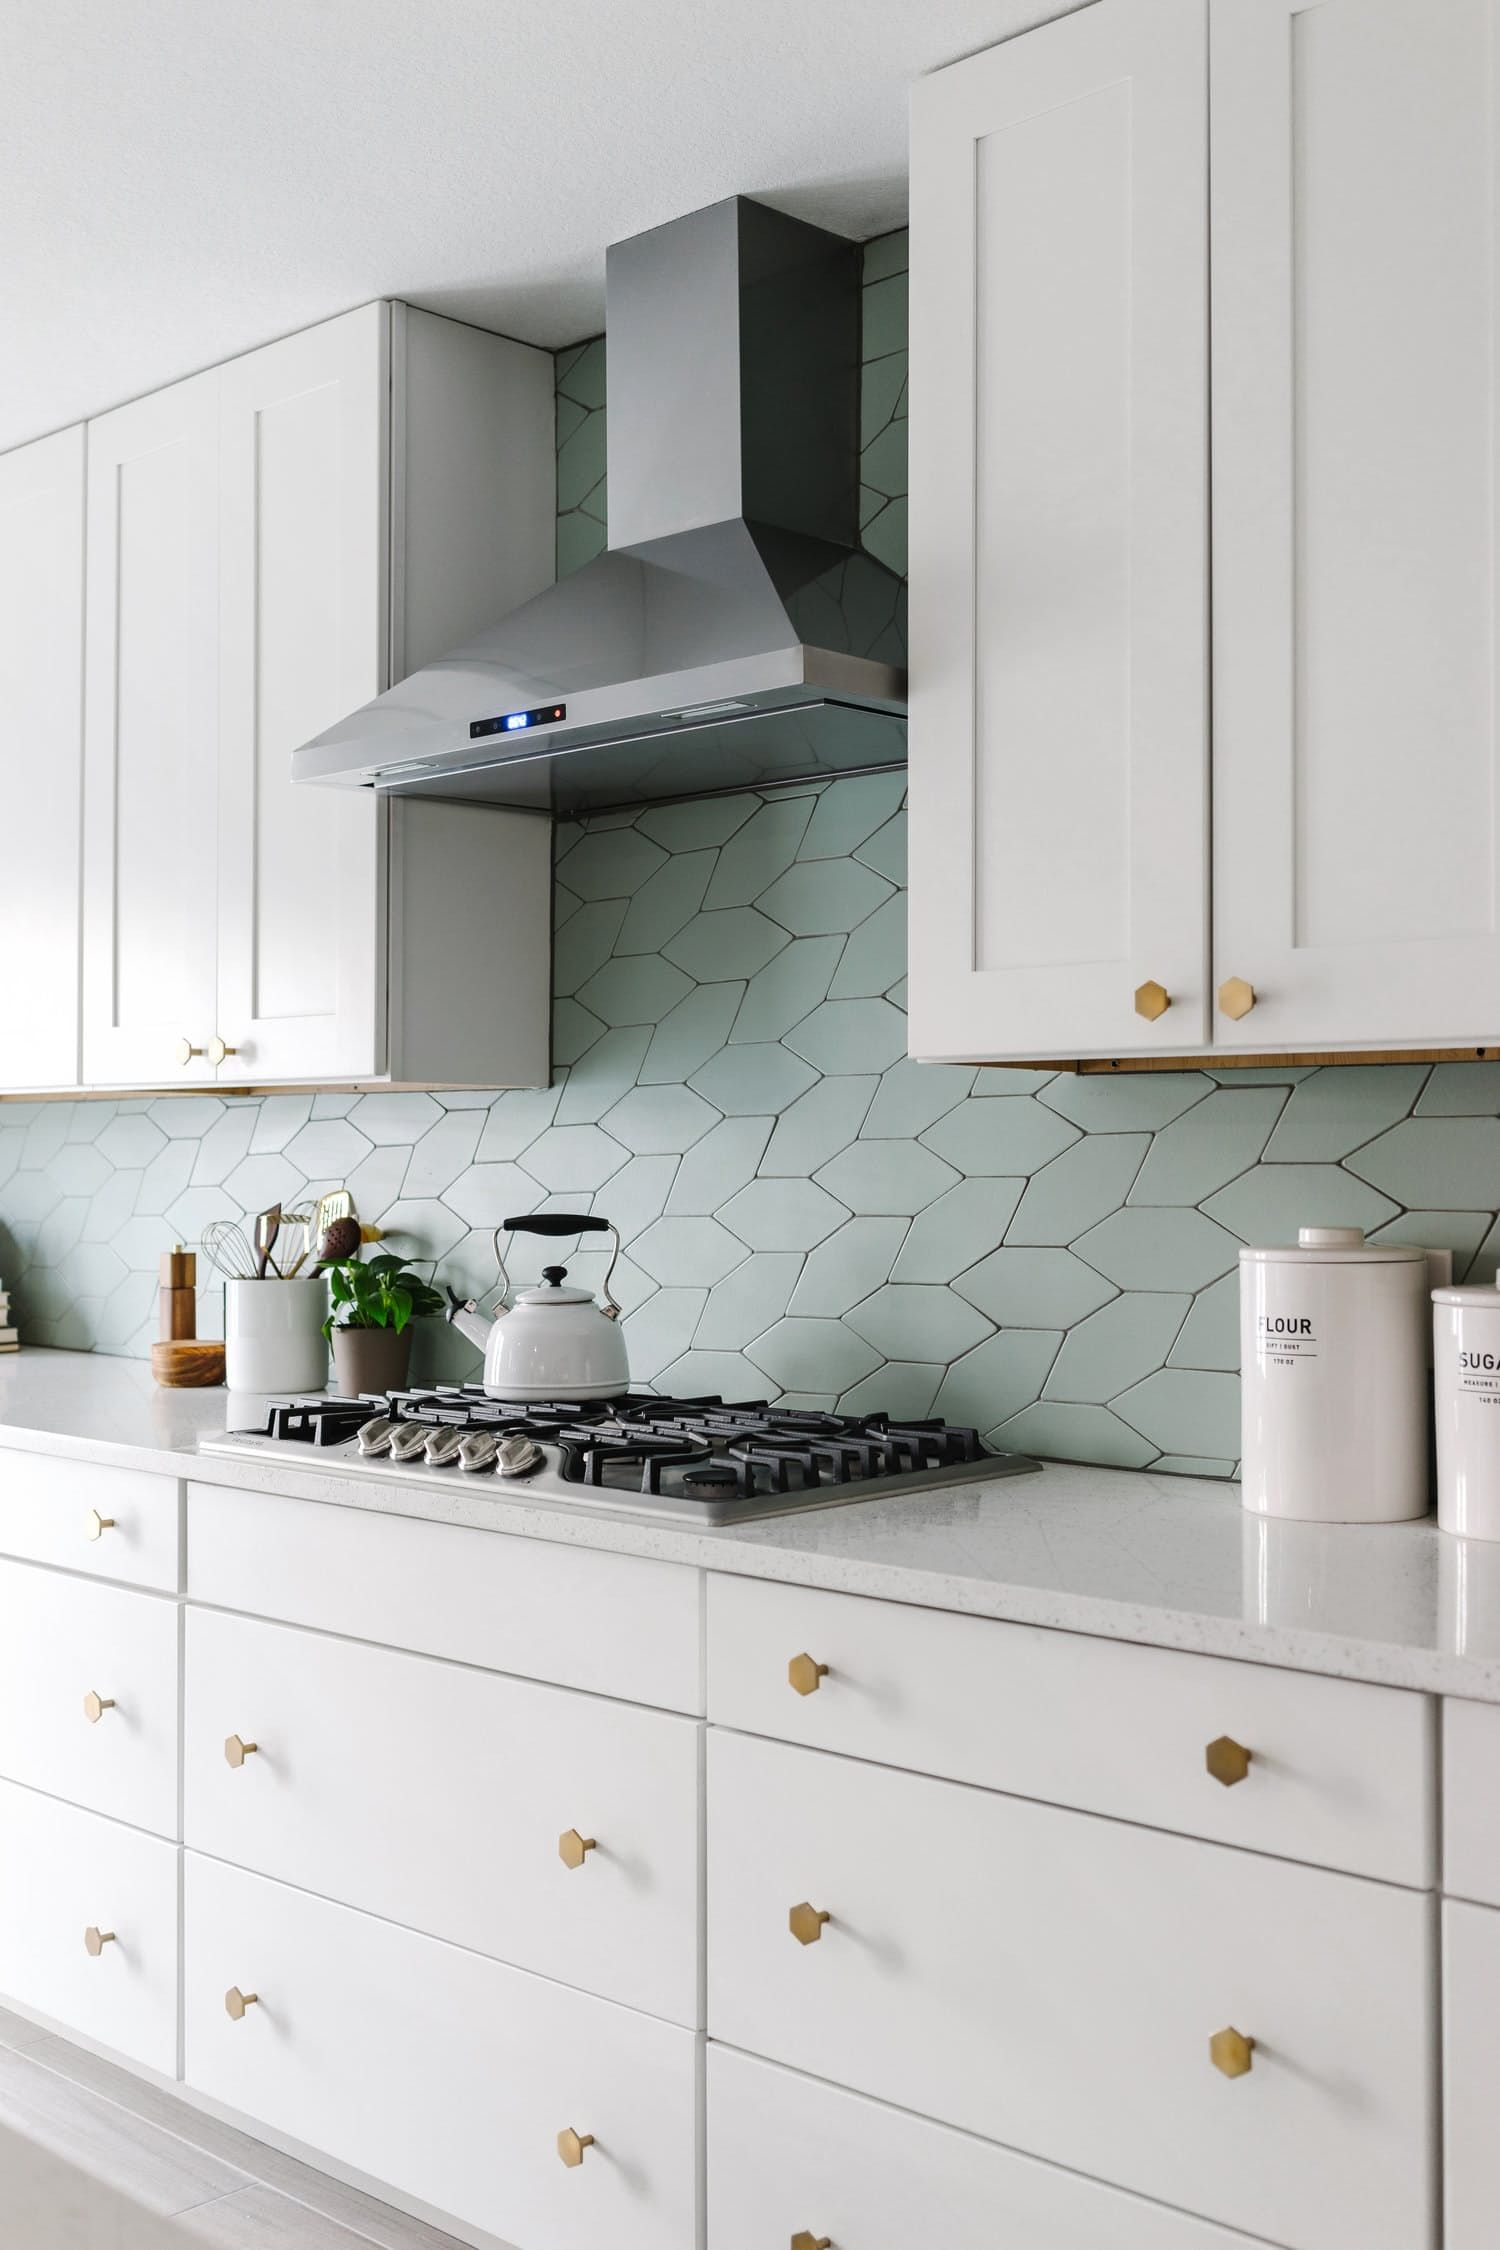 10 Badass Tile Shapes You Didn T Know Existed Kitchen Backsplash Designs Home Kitchens Kitchen Renovation